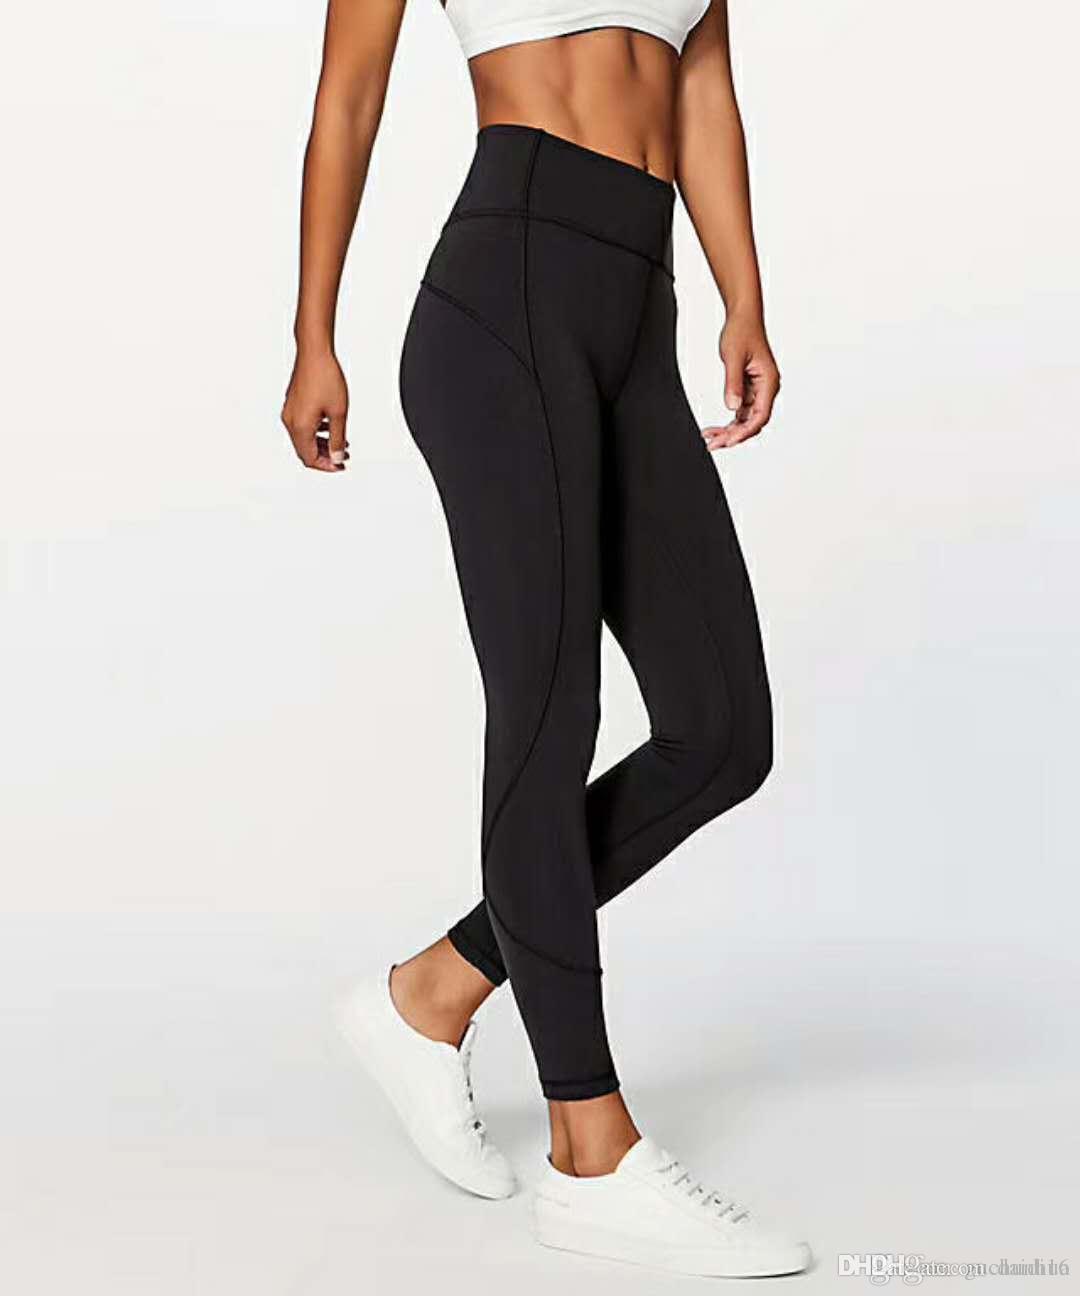 Fitness Wear Mädchen Marke Laufen Gamaschen Sporthose Frauen Yoga Outfits Damen Sport Voll Leggings Damen Hosen Übung